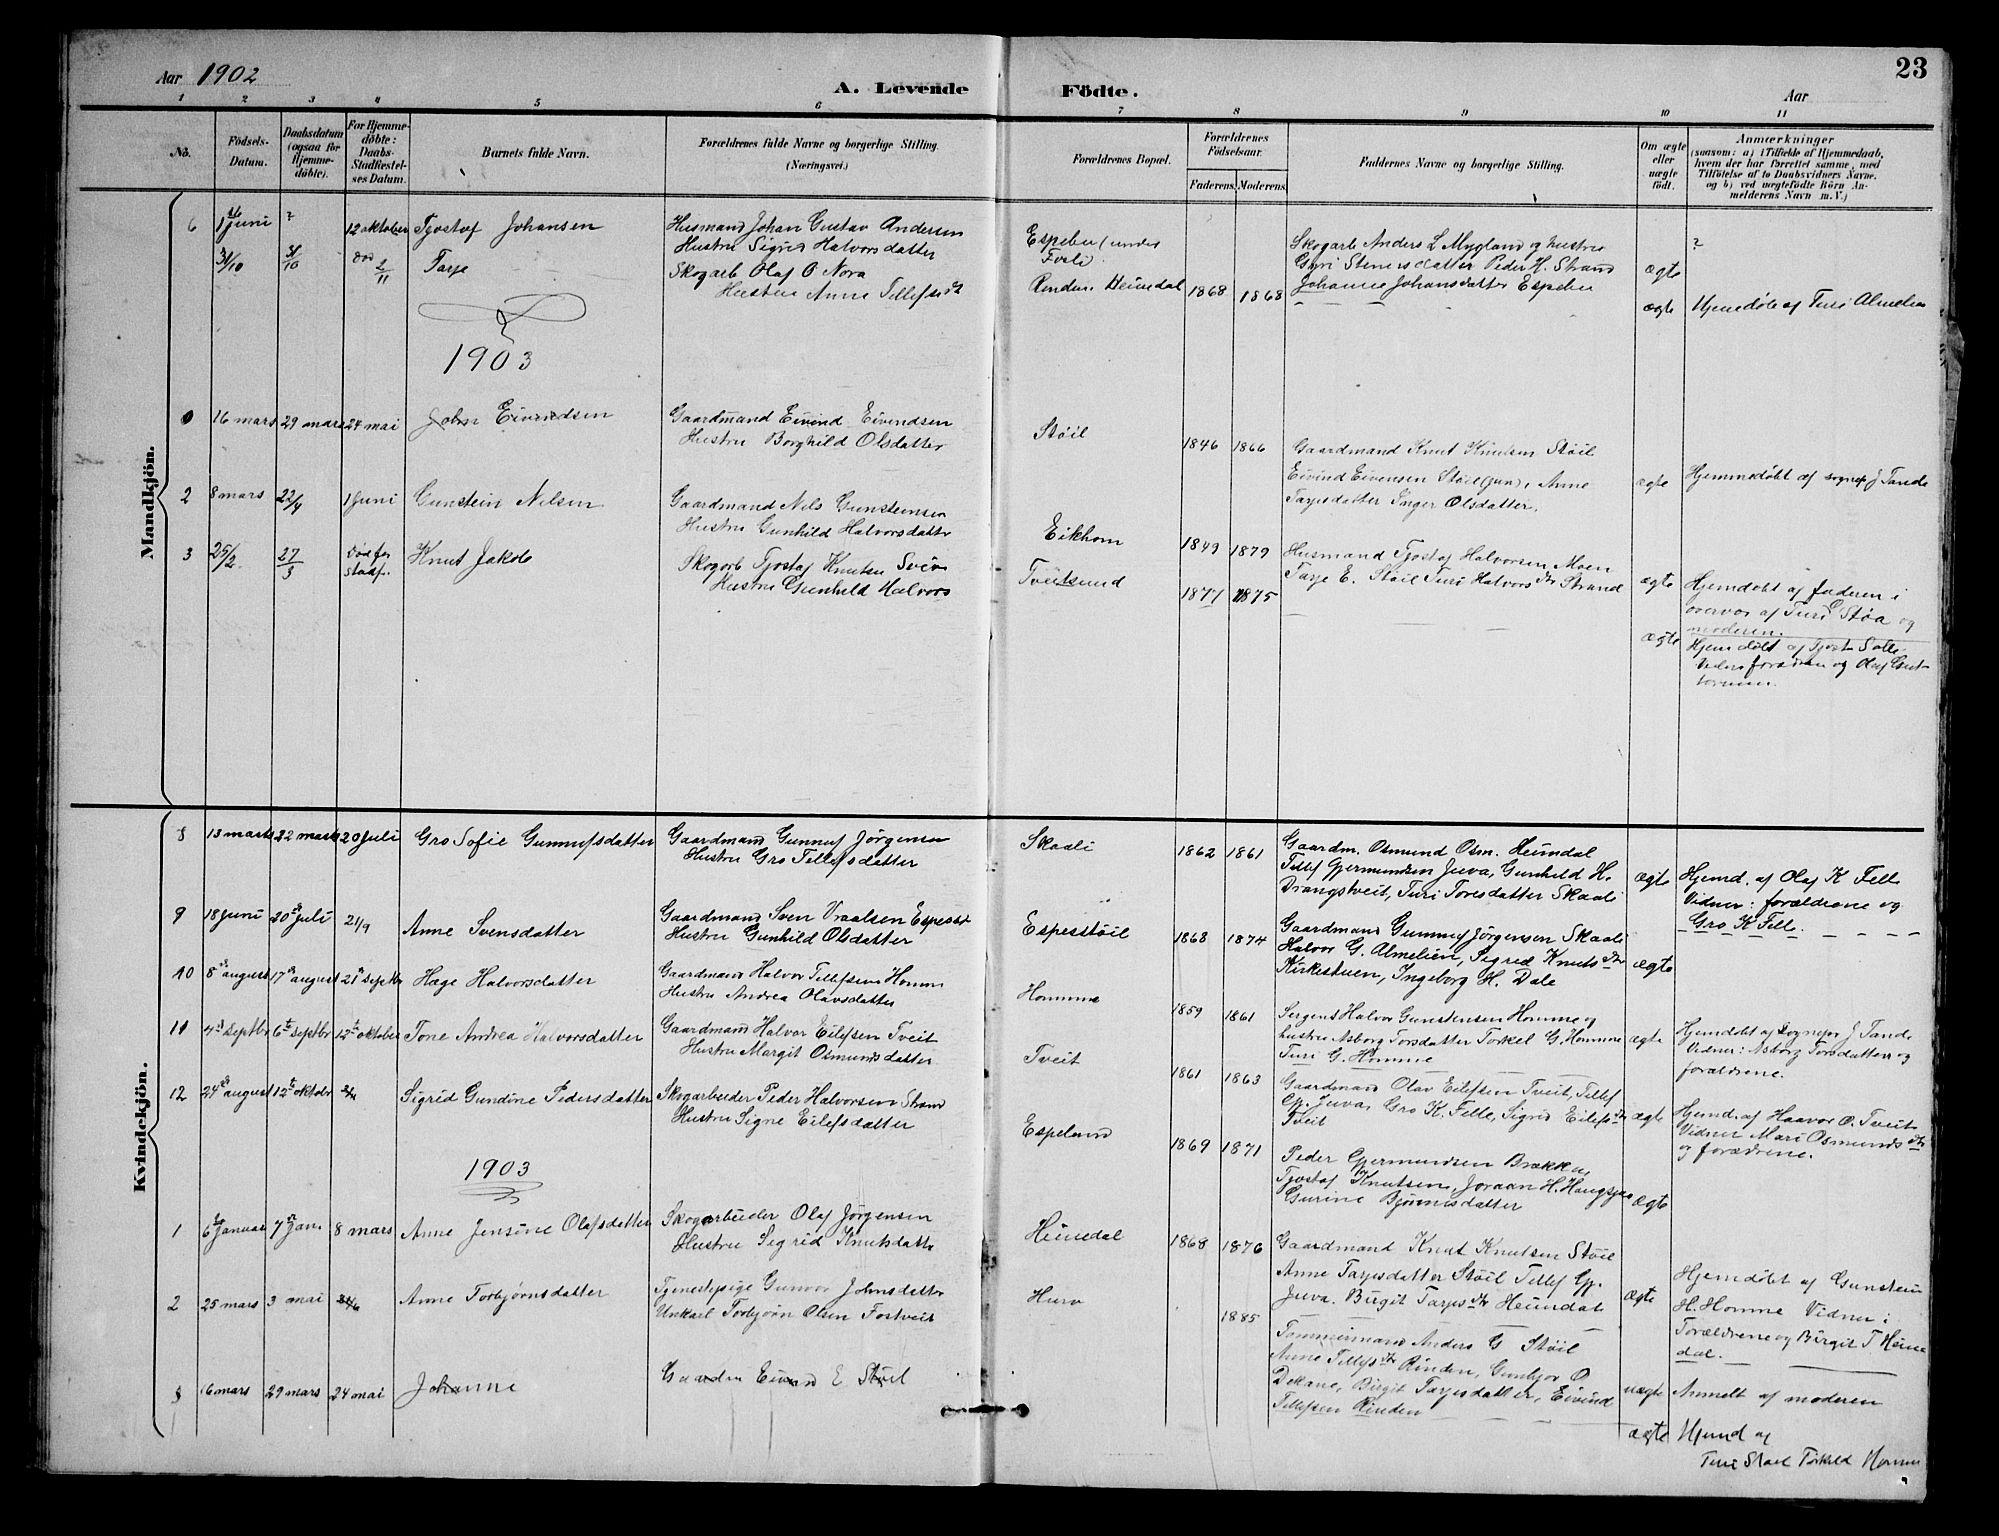 SAKO, Nissedal kirkebøker, G/Gb/L0003: Klokkerbok nr. II 3, 1893-1928, s. 23